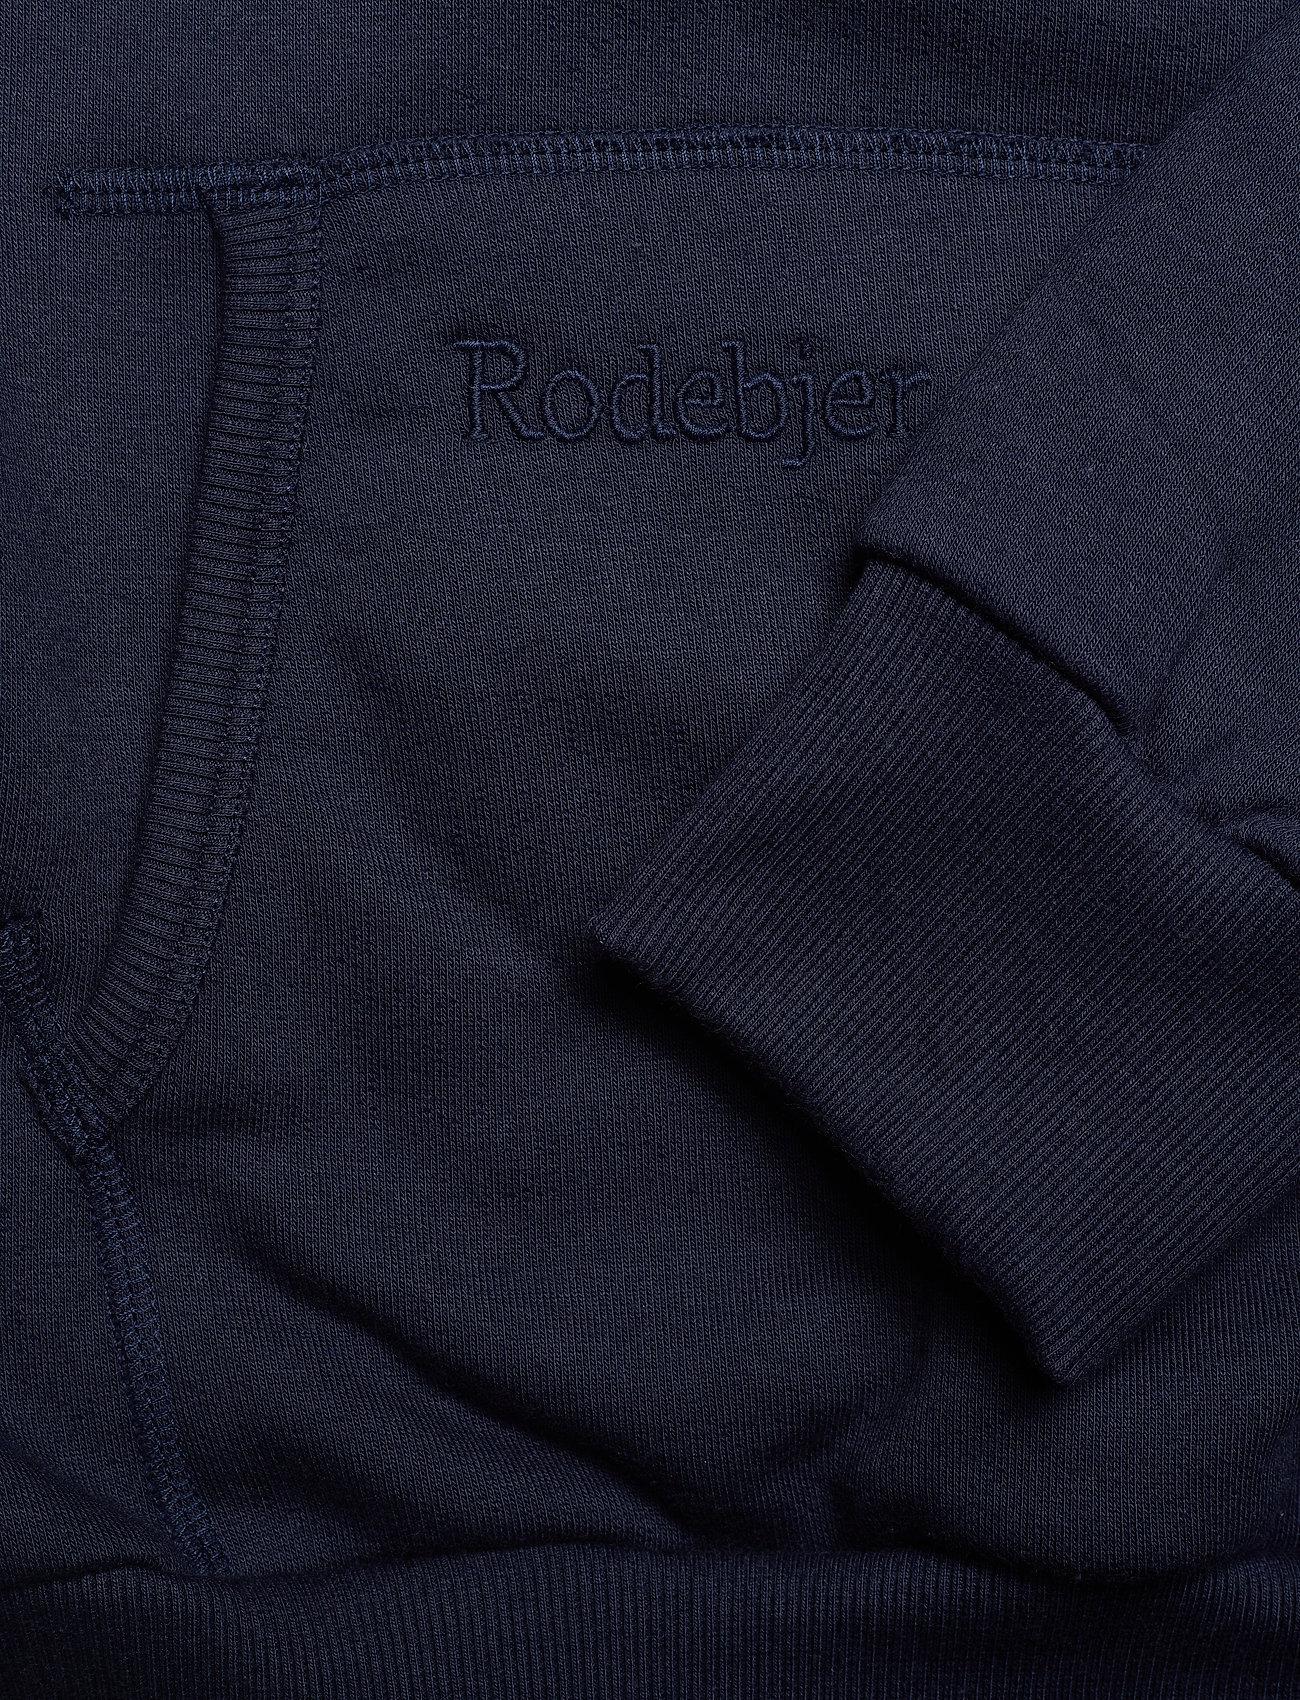 RODEBJER - RODEBJER MARQUESSA - sweatshirts & hættetrøjer - navy - 3